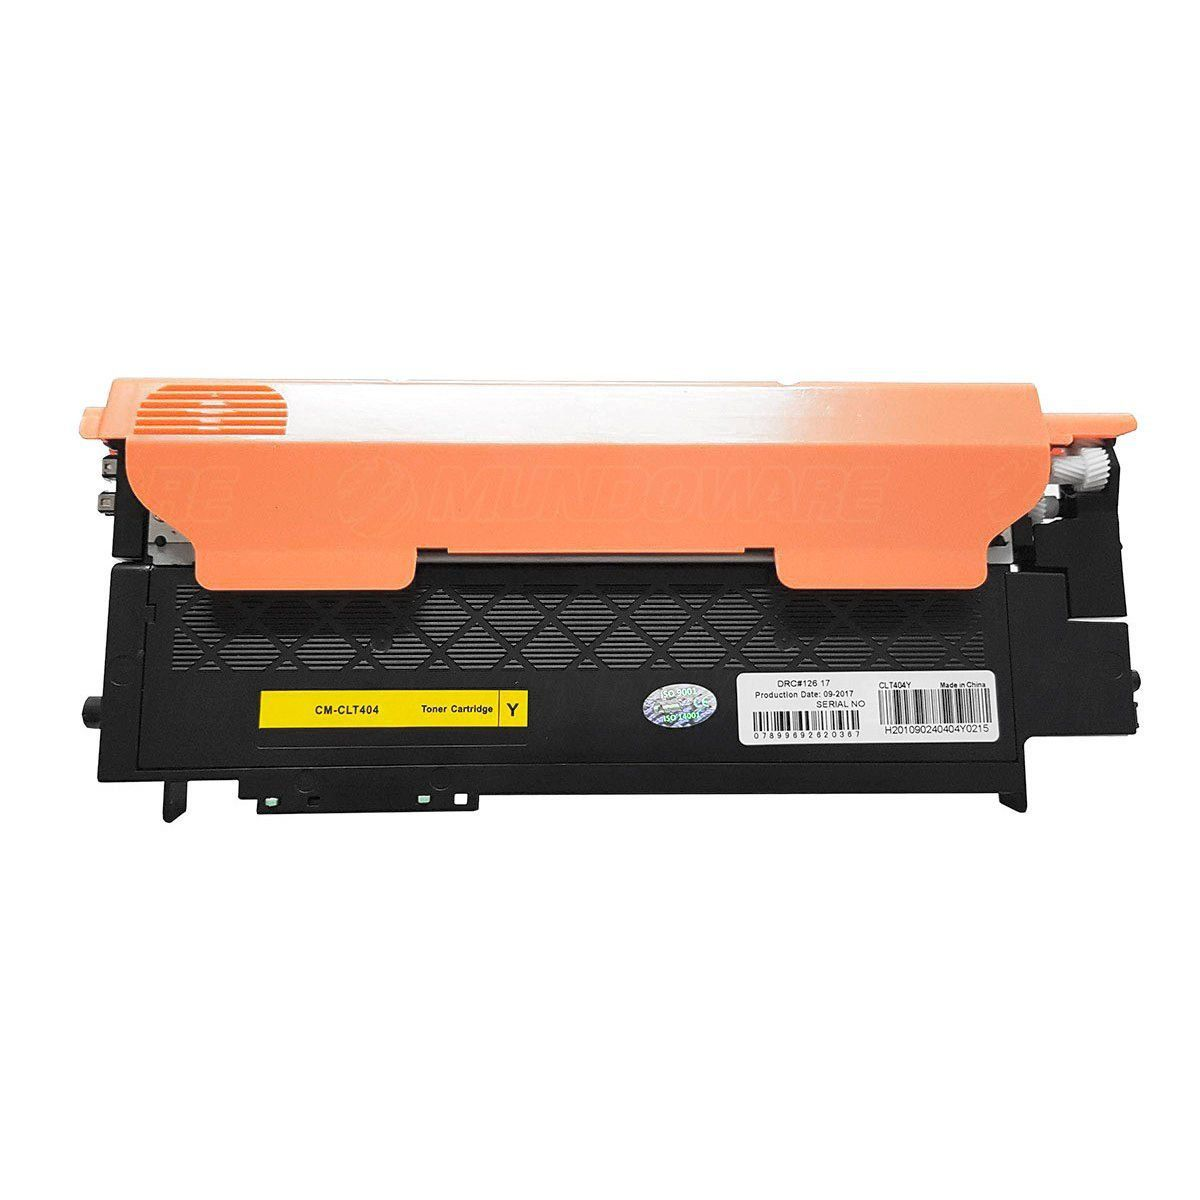 Compatível: Toner CLT-404 Y404S para Impressora Samsung SL-C430 C430w C480 C480w C480fn C480fw / Amarelo / 1.000